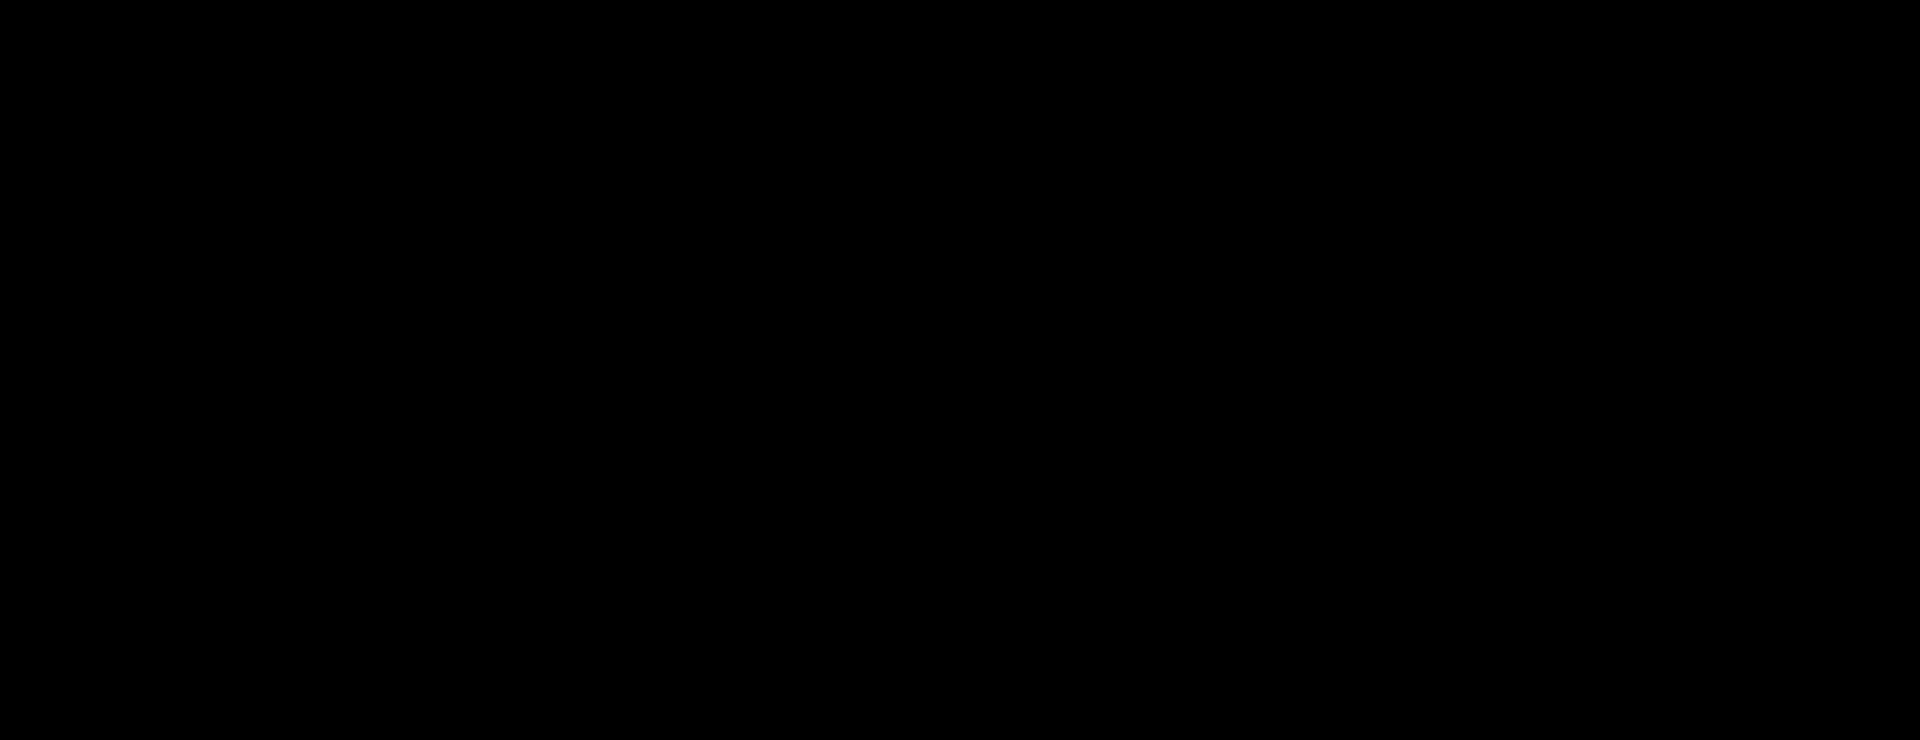 tetris original musik